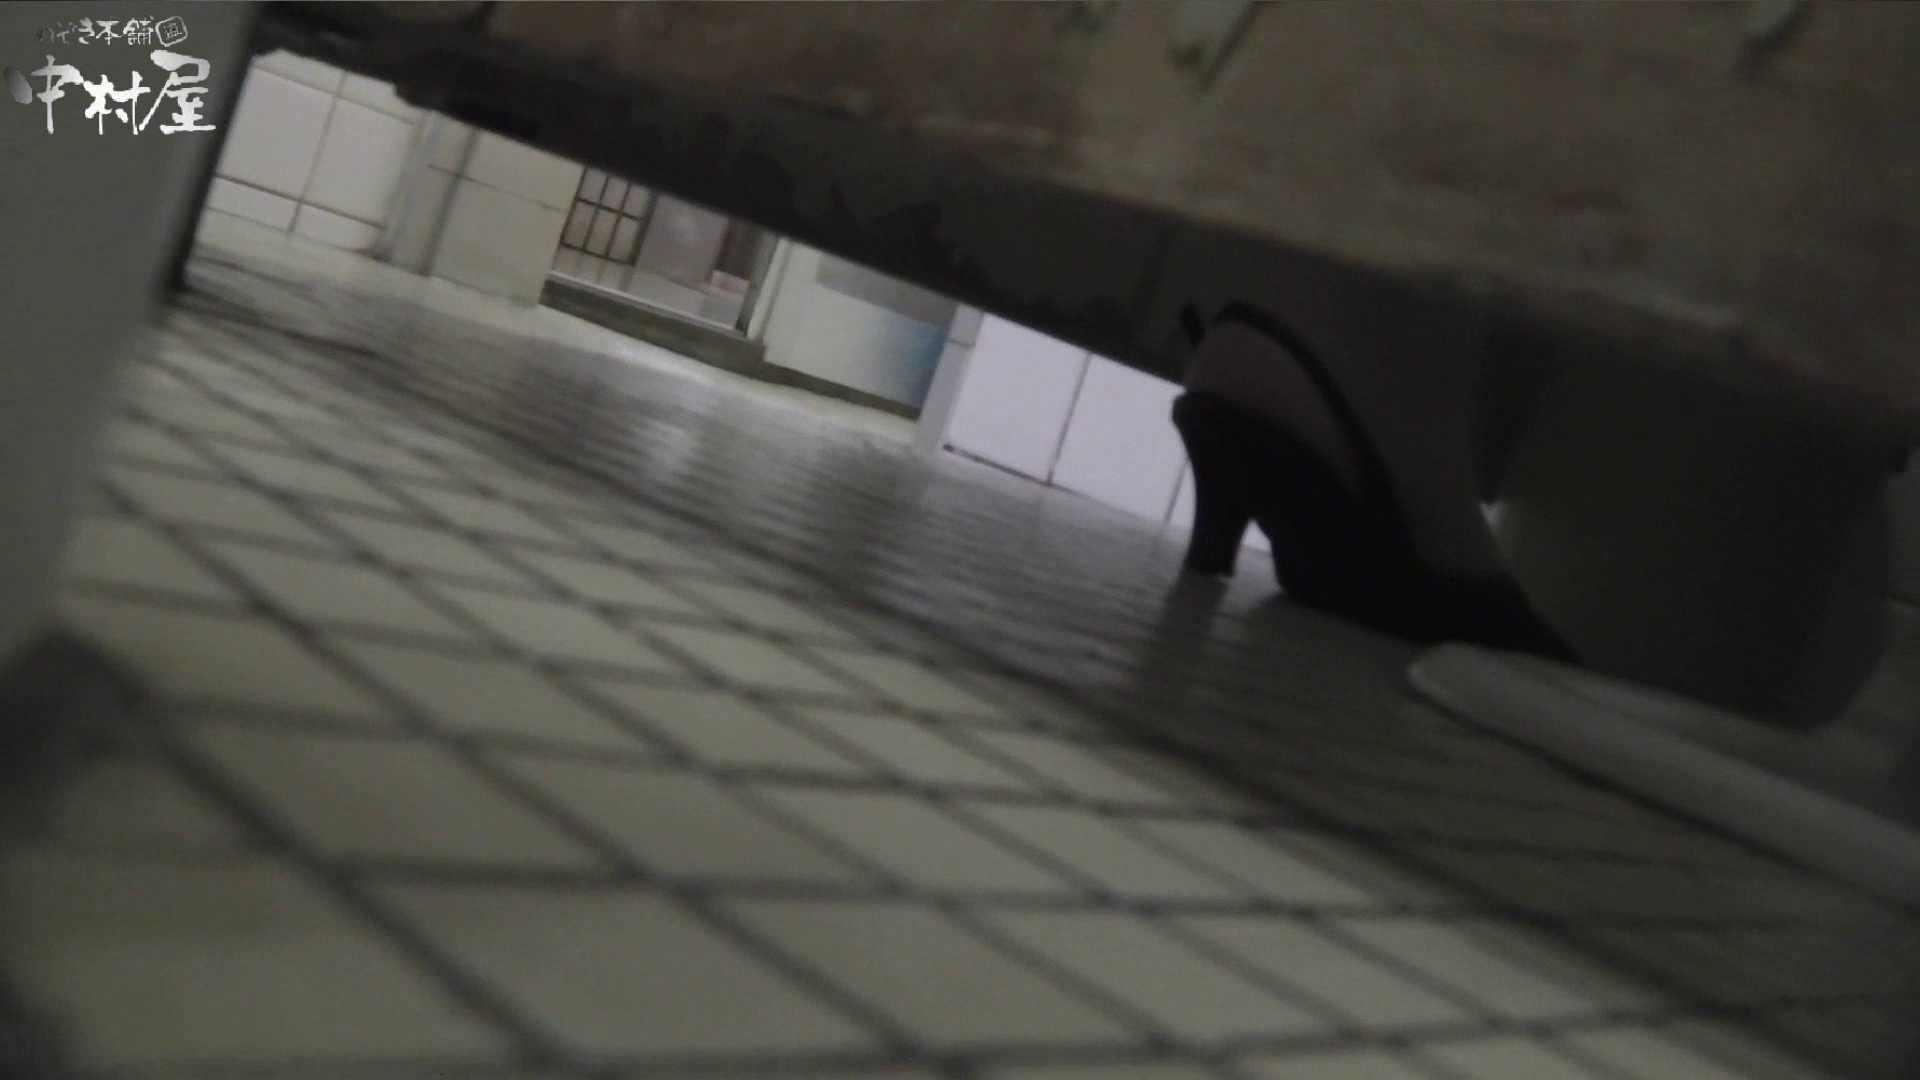 vol.41 命がけ潜伏洗面所! 毛薄め・硬度並・推定250g プライベート ワレメ無修正動画無料 112PIX 14